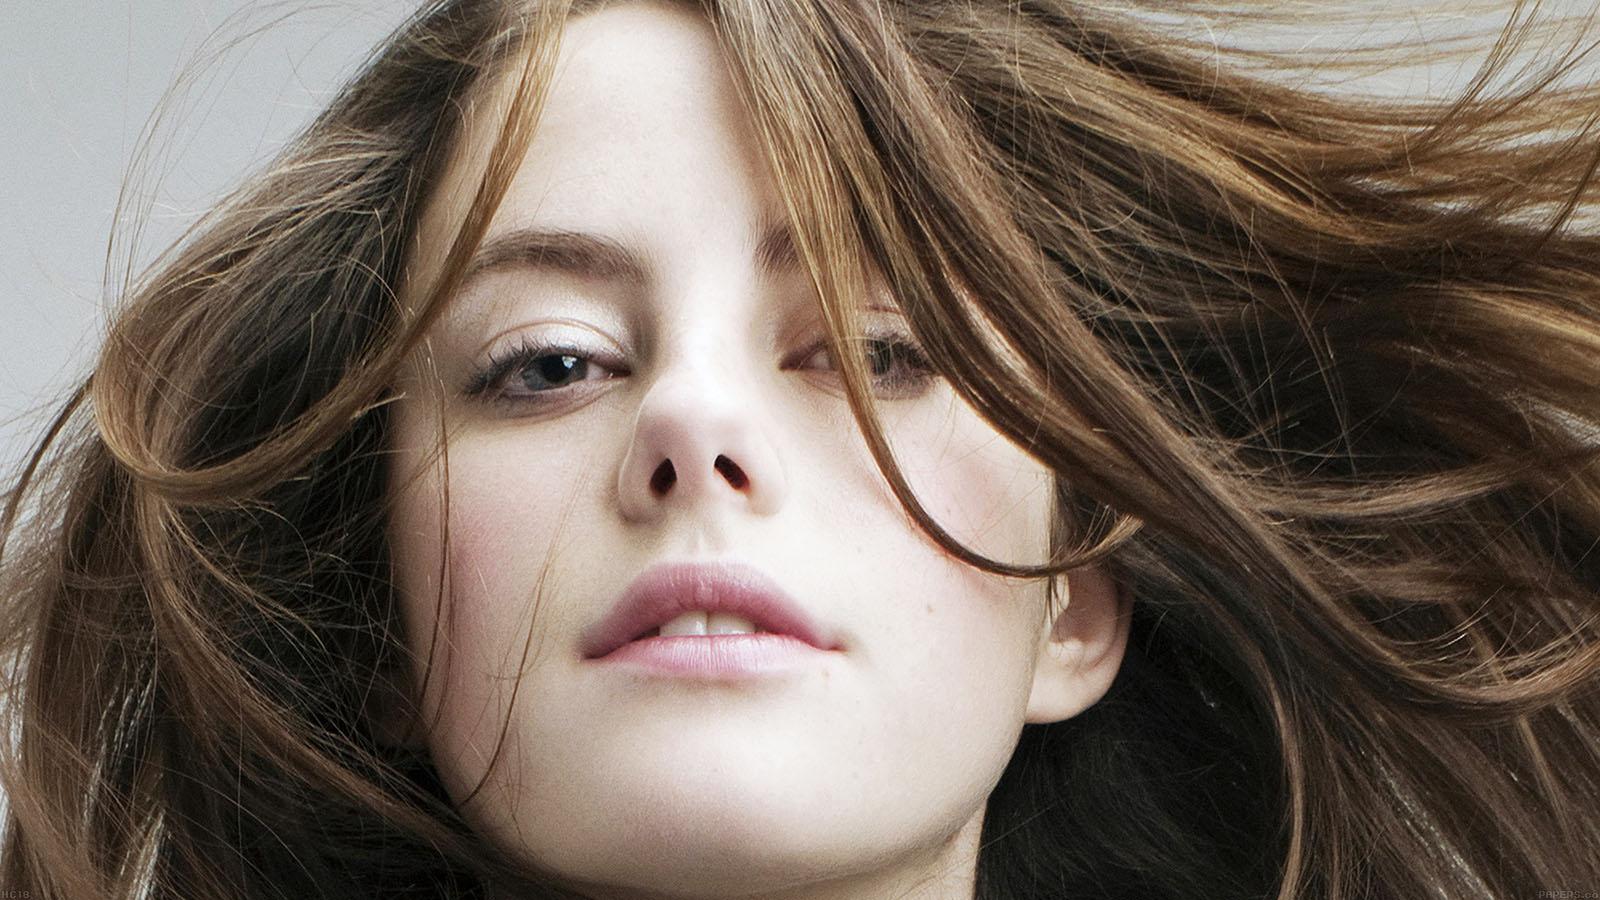 Cute Black And White Disney Desktop Wallpapers Hc18 Kaya Scodelario Actress Sexy Hair Papers Co